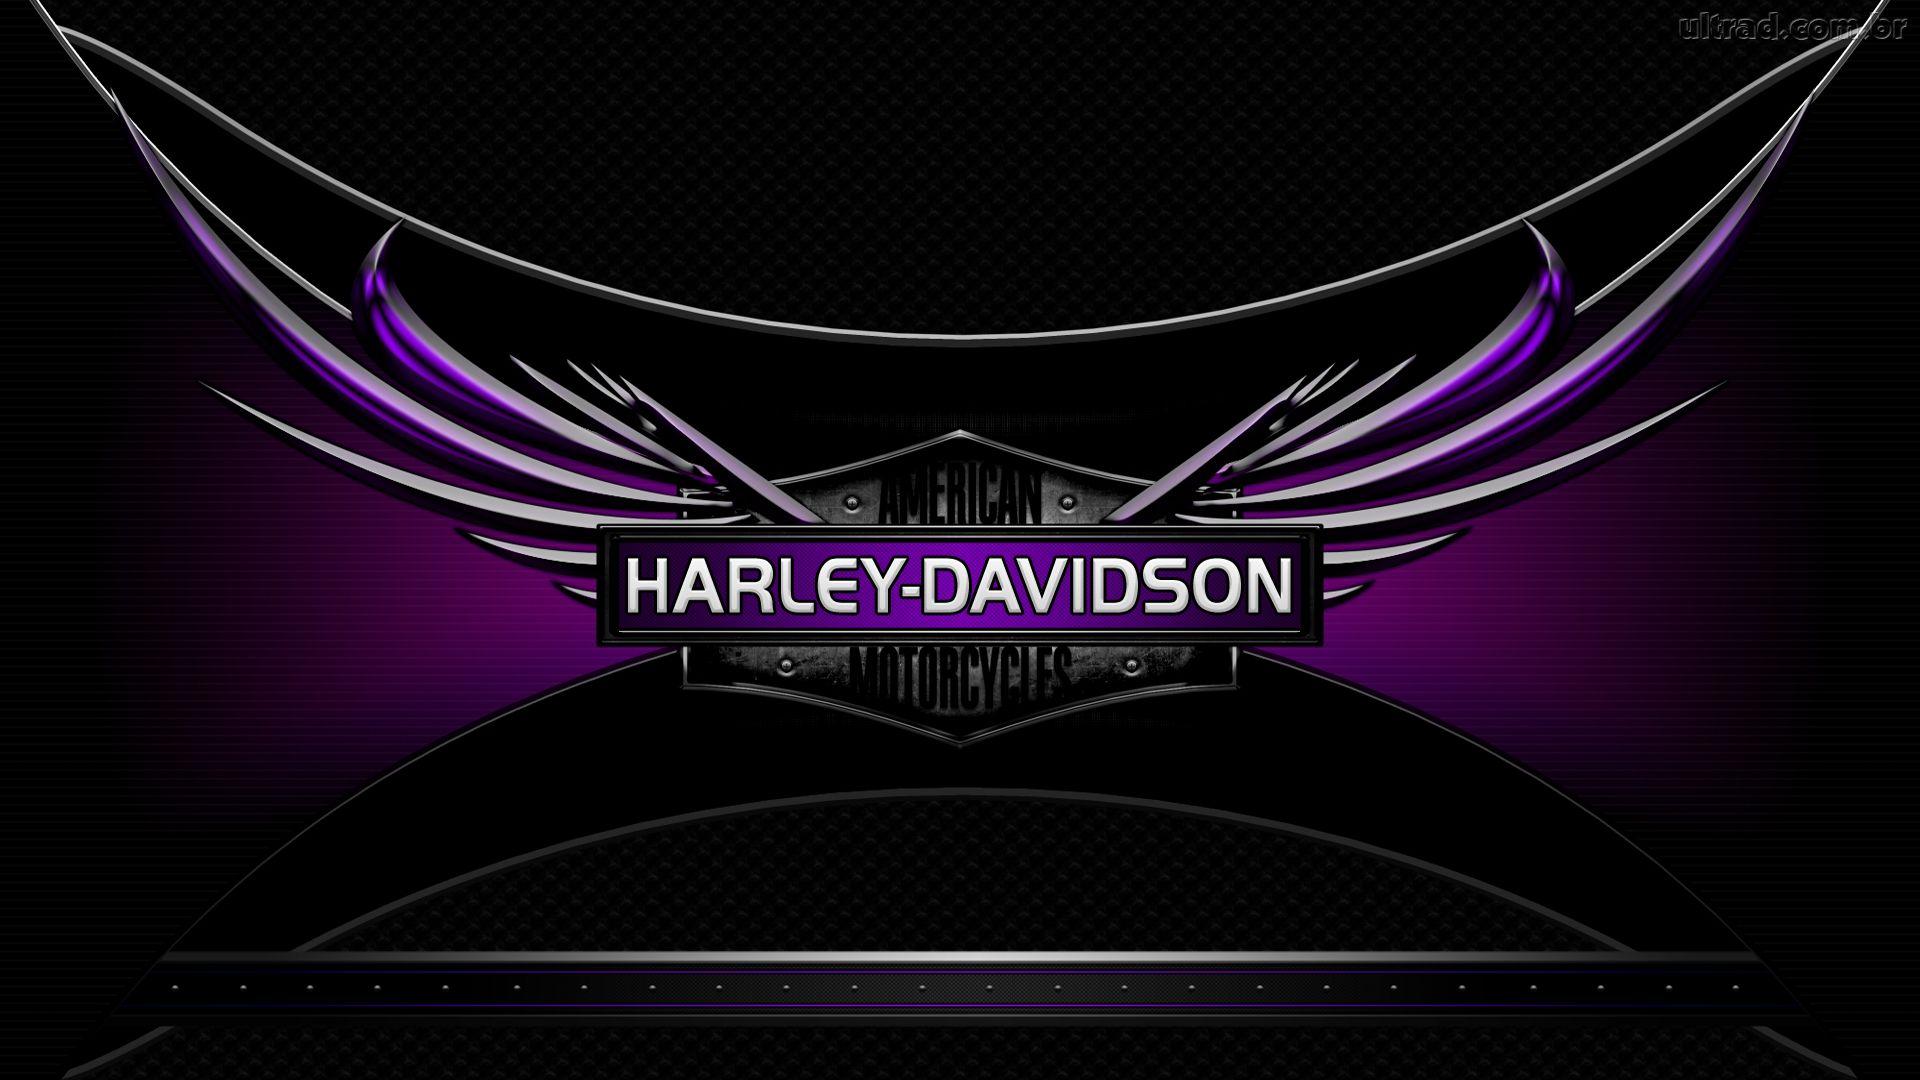 Harley Davidson Logo wallpaper   981546 1920x1080